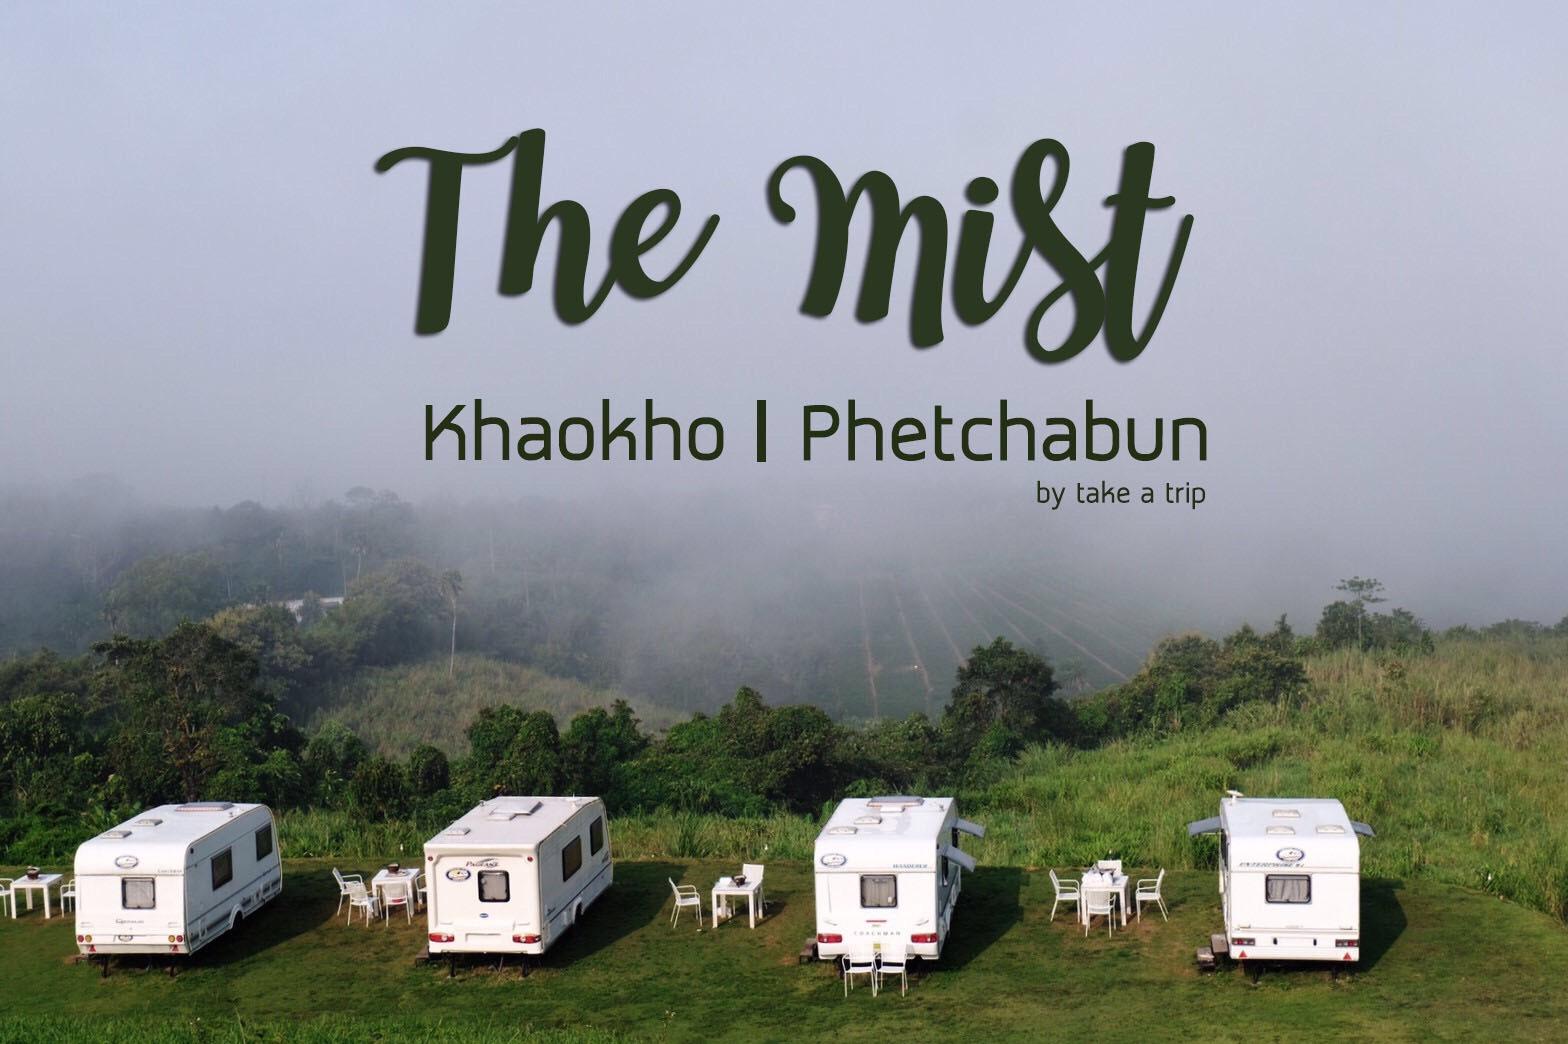 4. The Mist Khao Kho เขาค้อ เพชรบูรณ์ 02